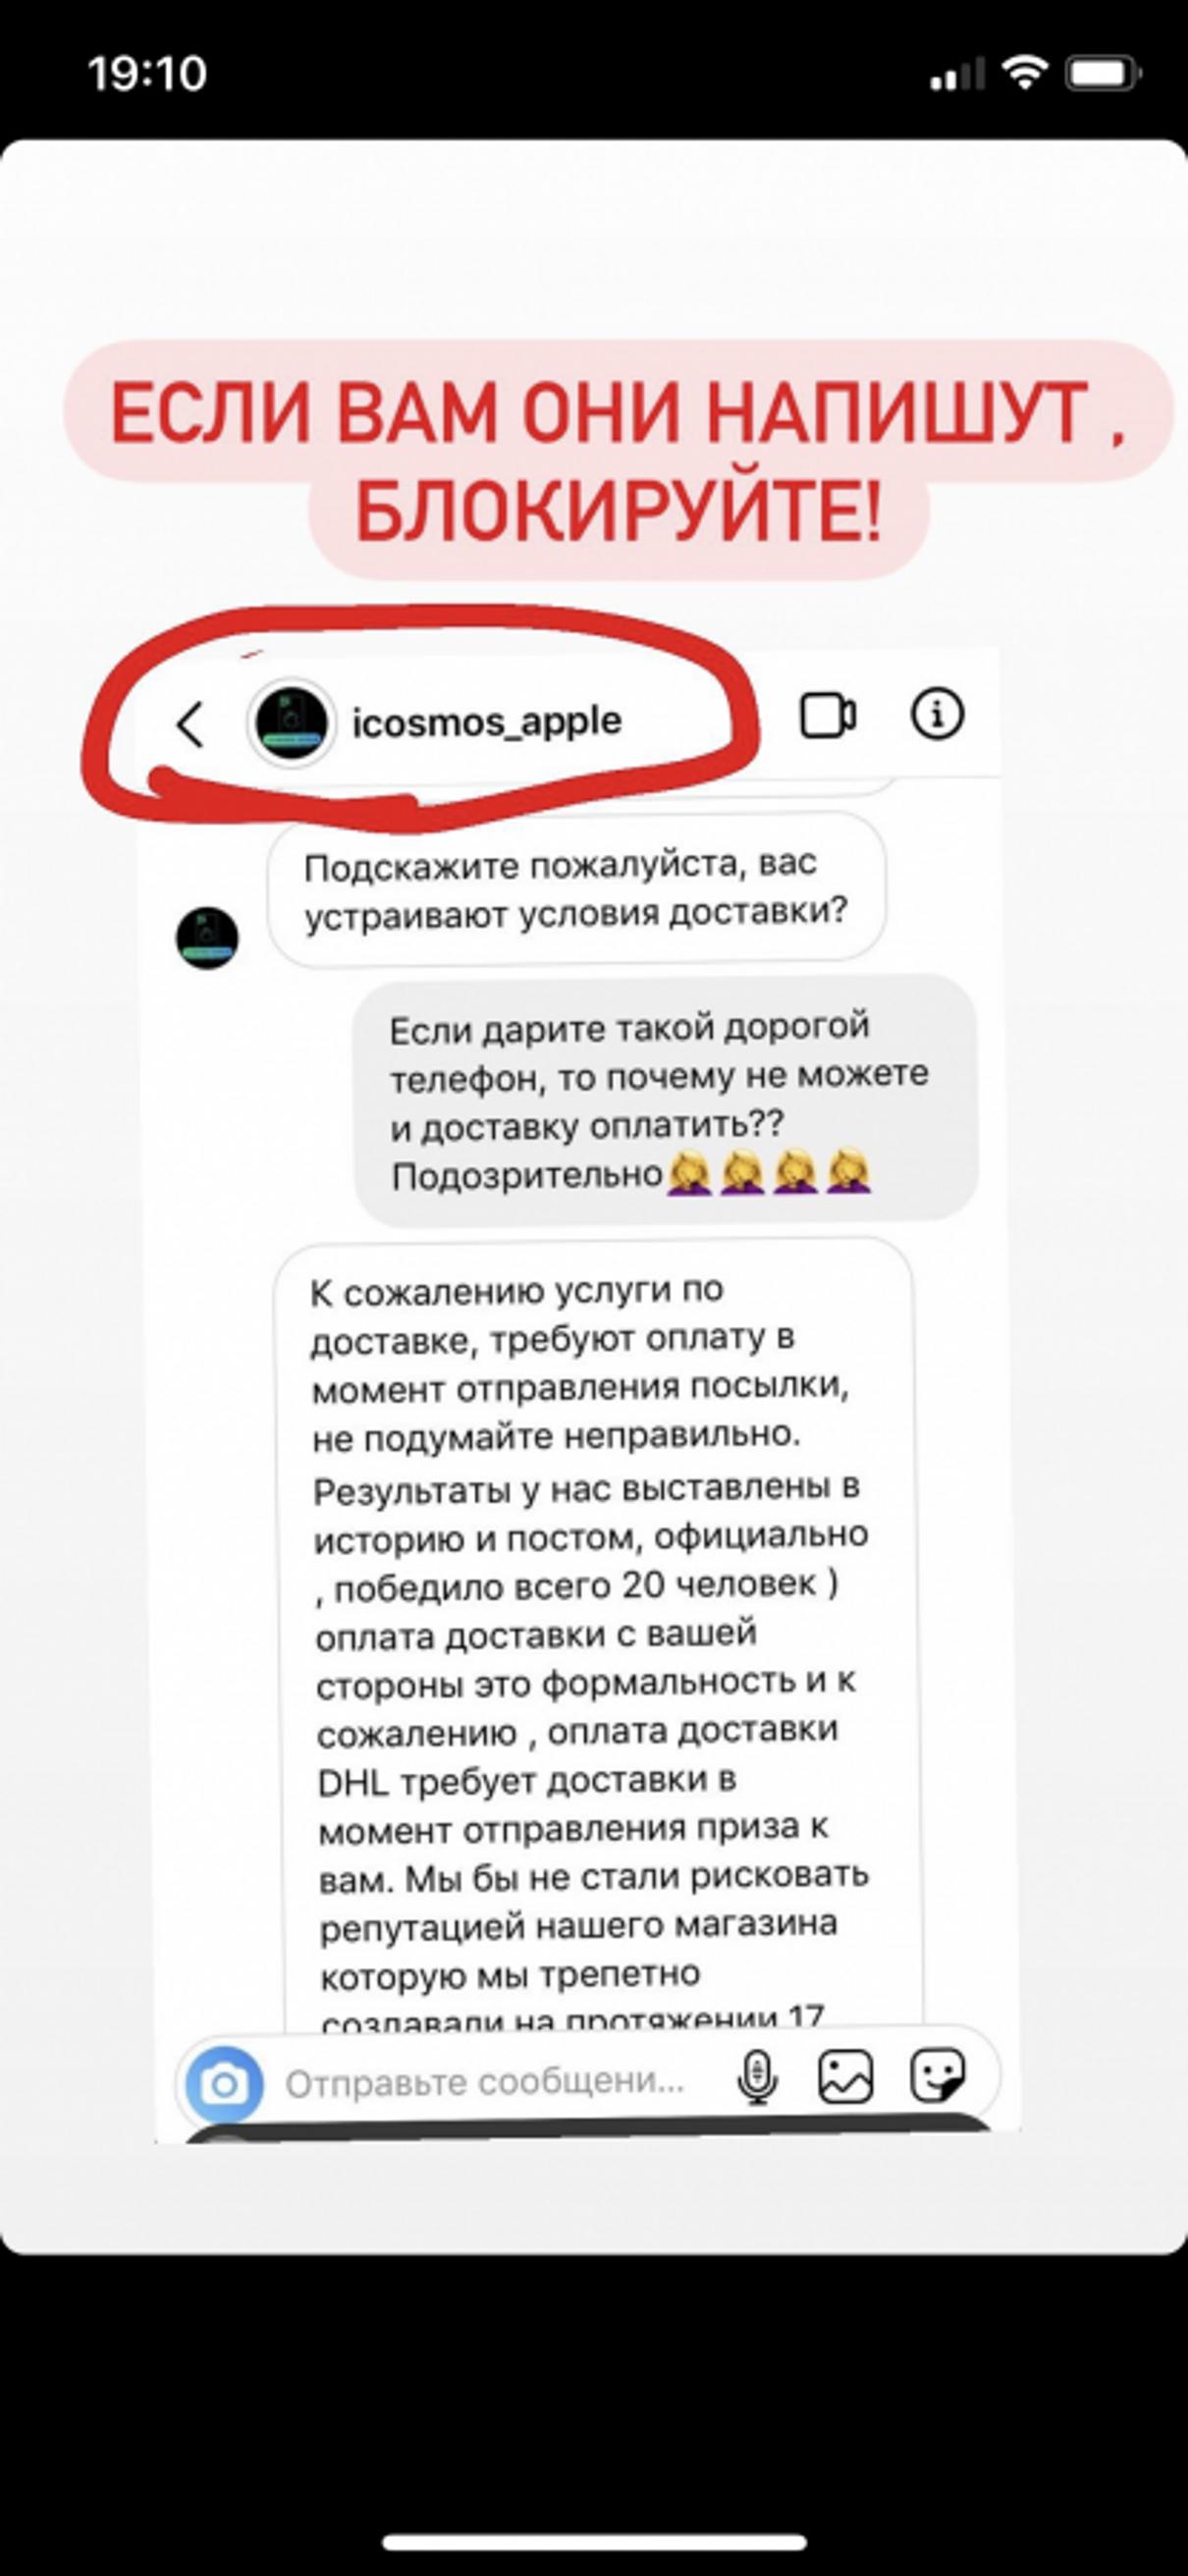 Жалоба-отзыв: Icosmos_apple ( в Инстаграмм ) - Https://instagram.com/icosmos_apple? igshid=1oc7px87b03ue